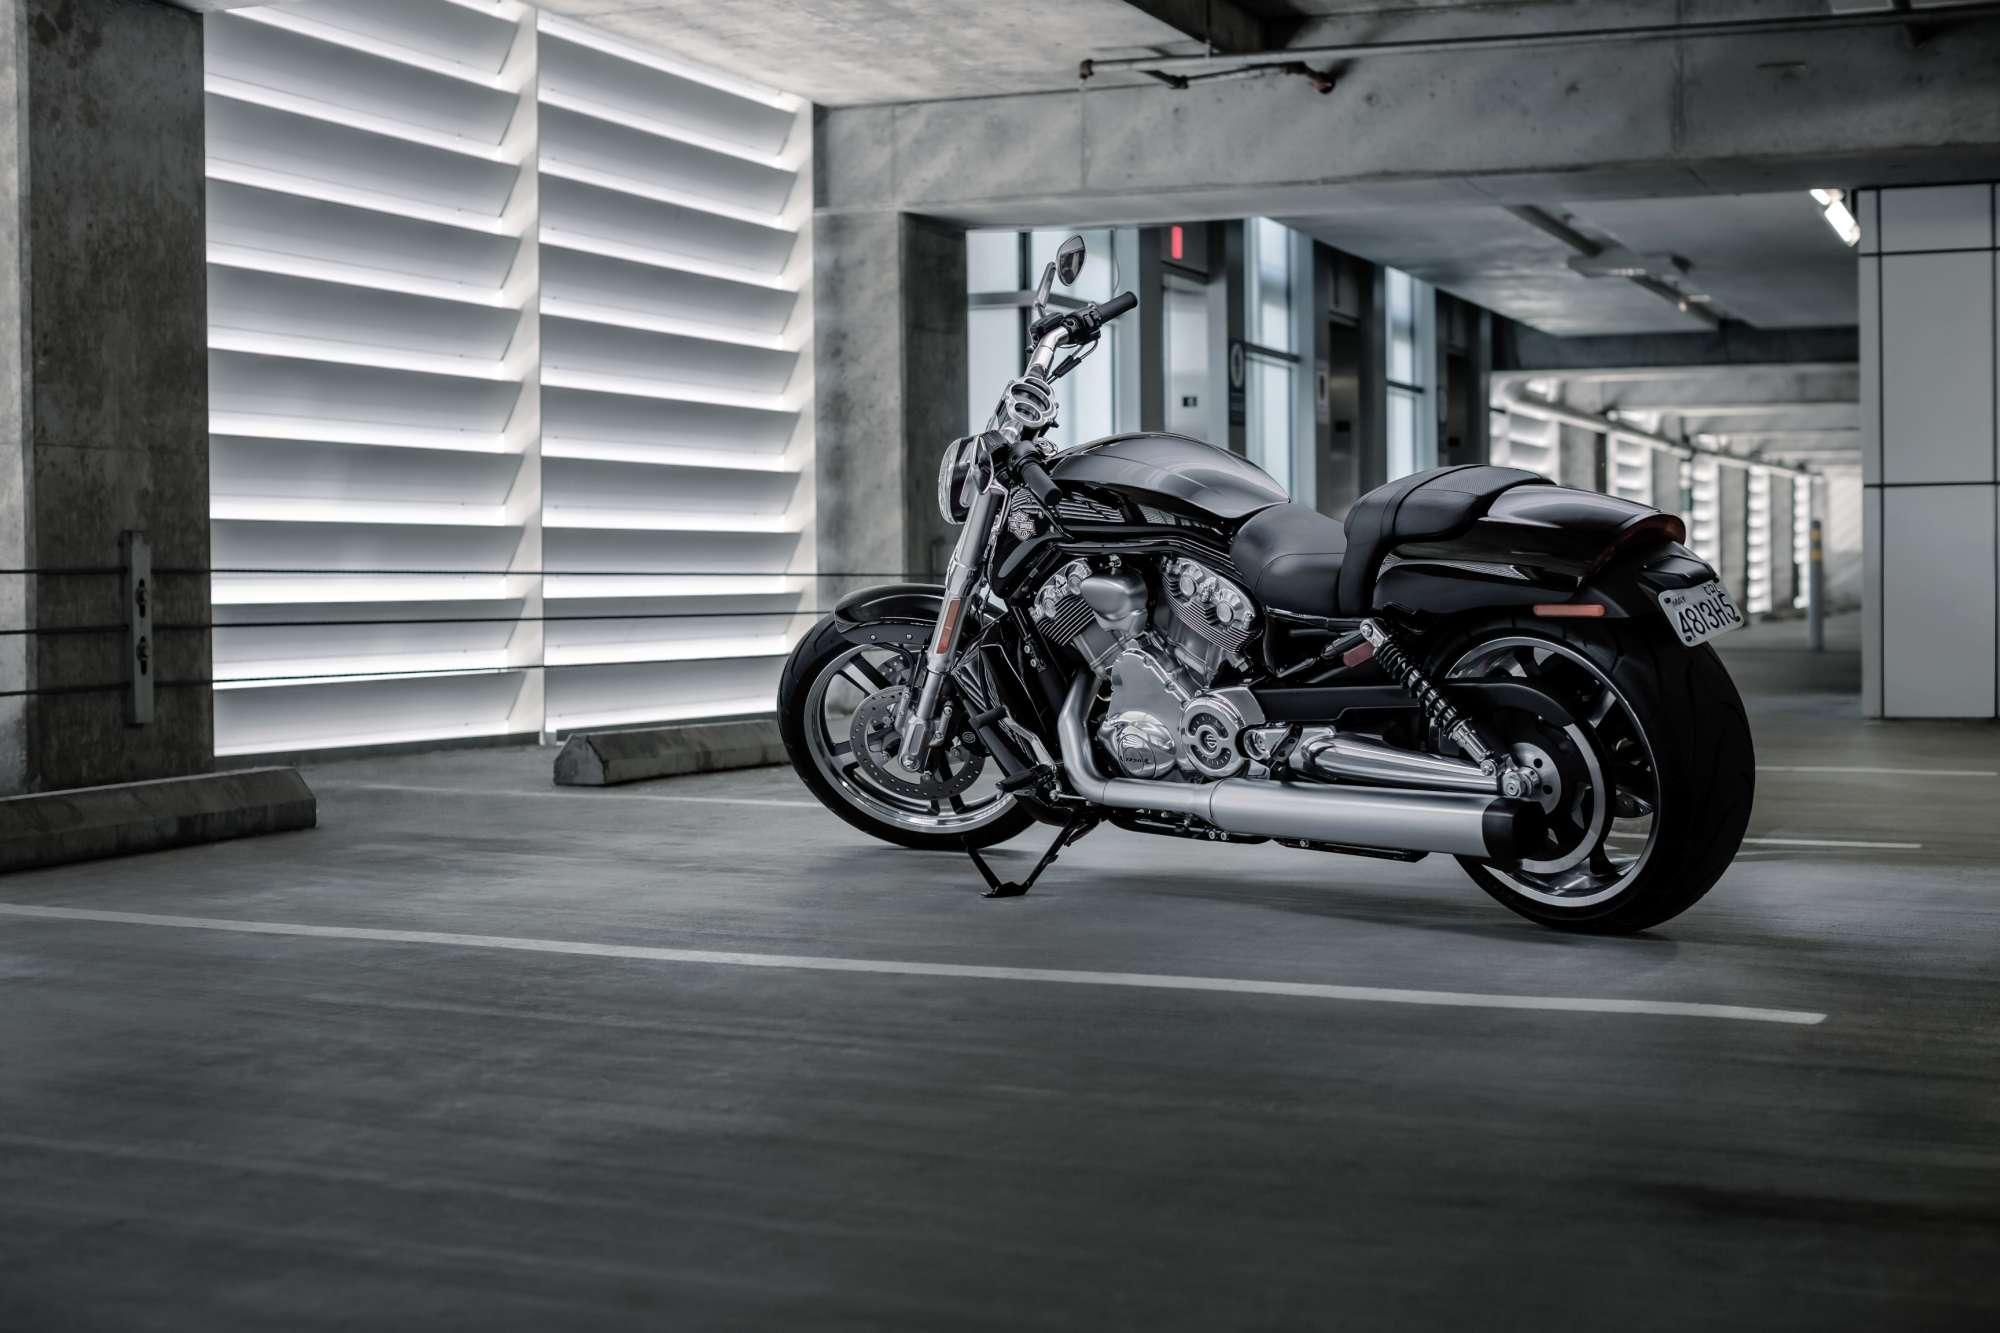 Rod Muscle Harley Davidson V Night 2000x1333